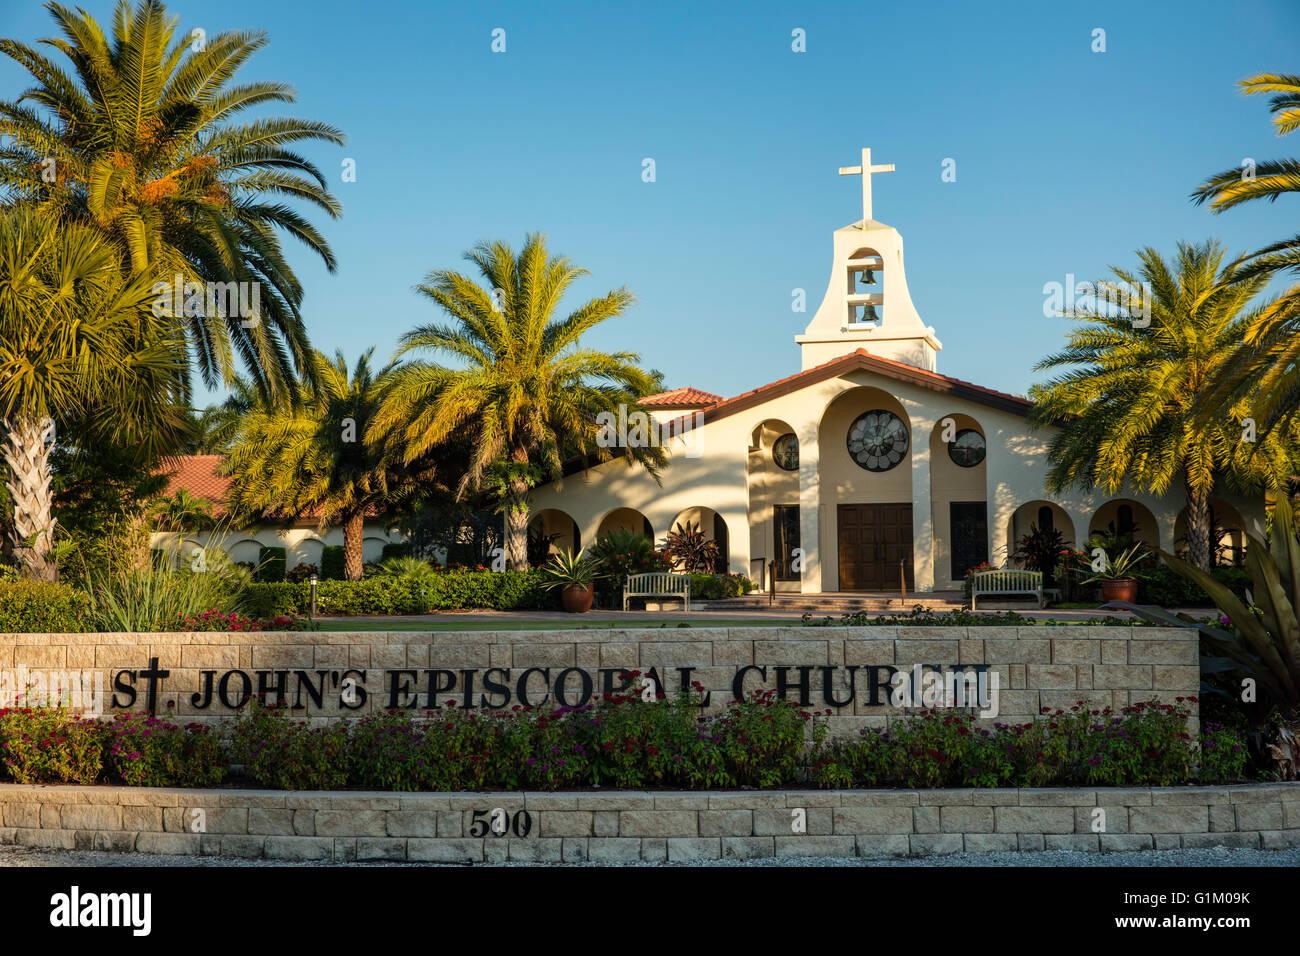 St. John's Episcopal Church, Naples, Florida, USA - Stock Image